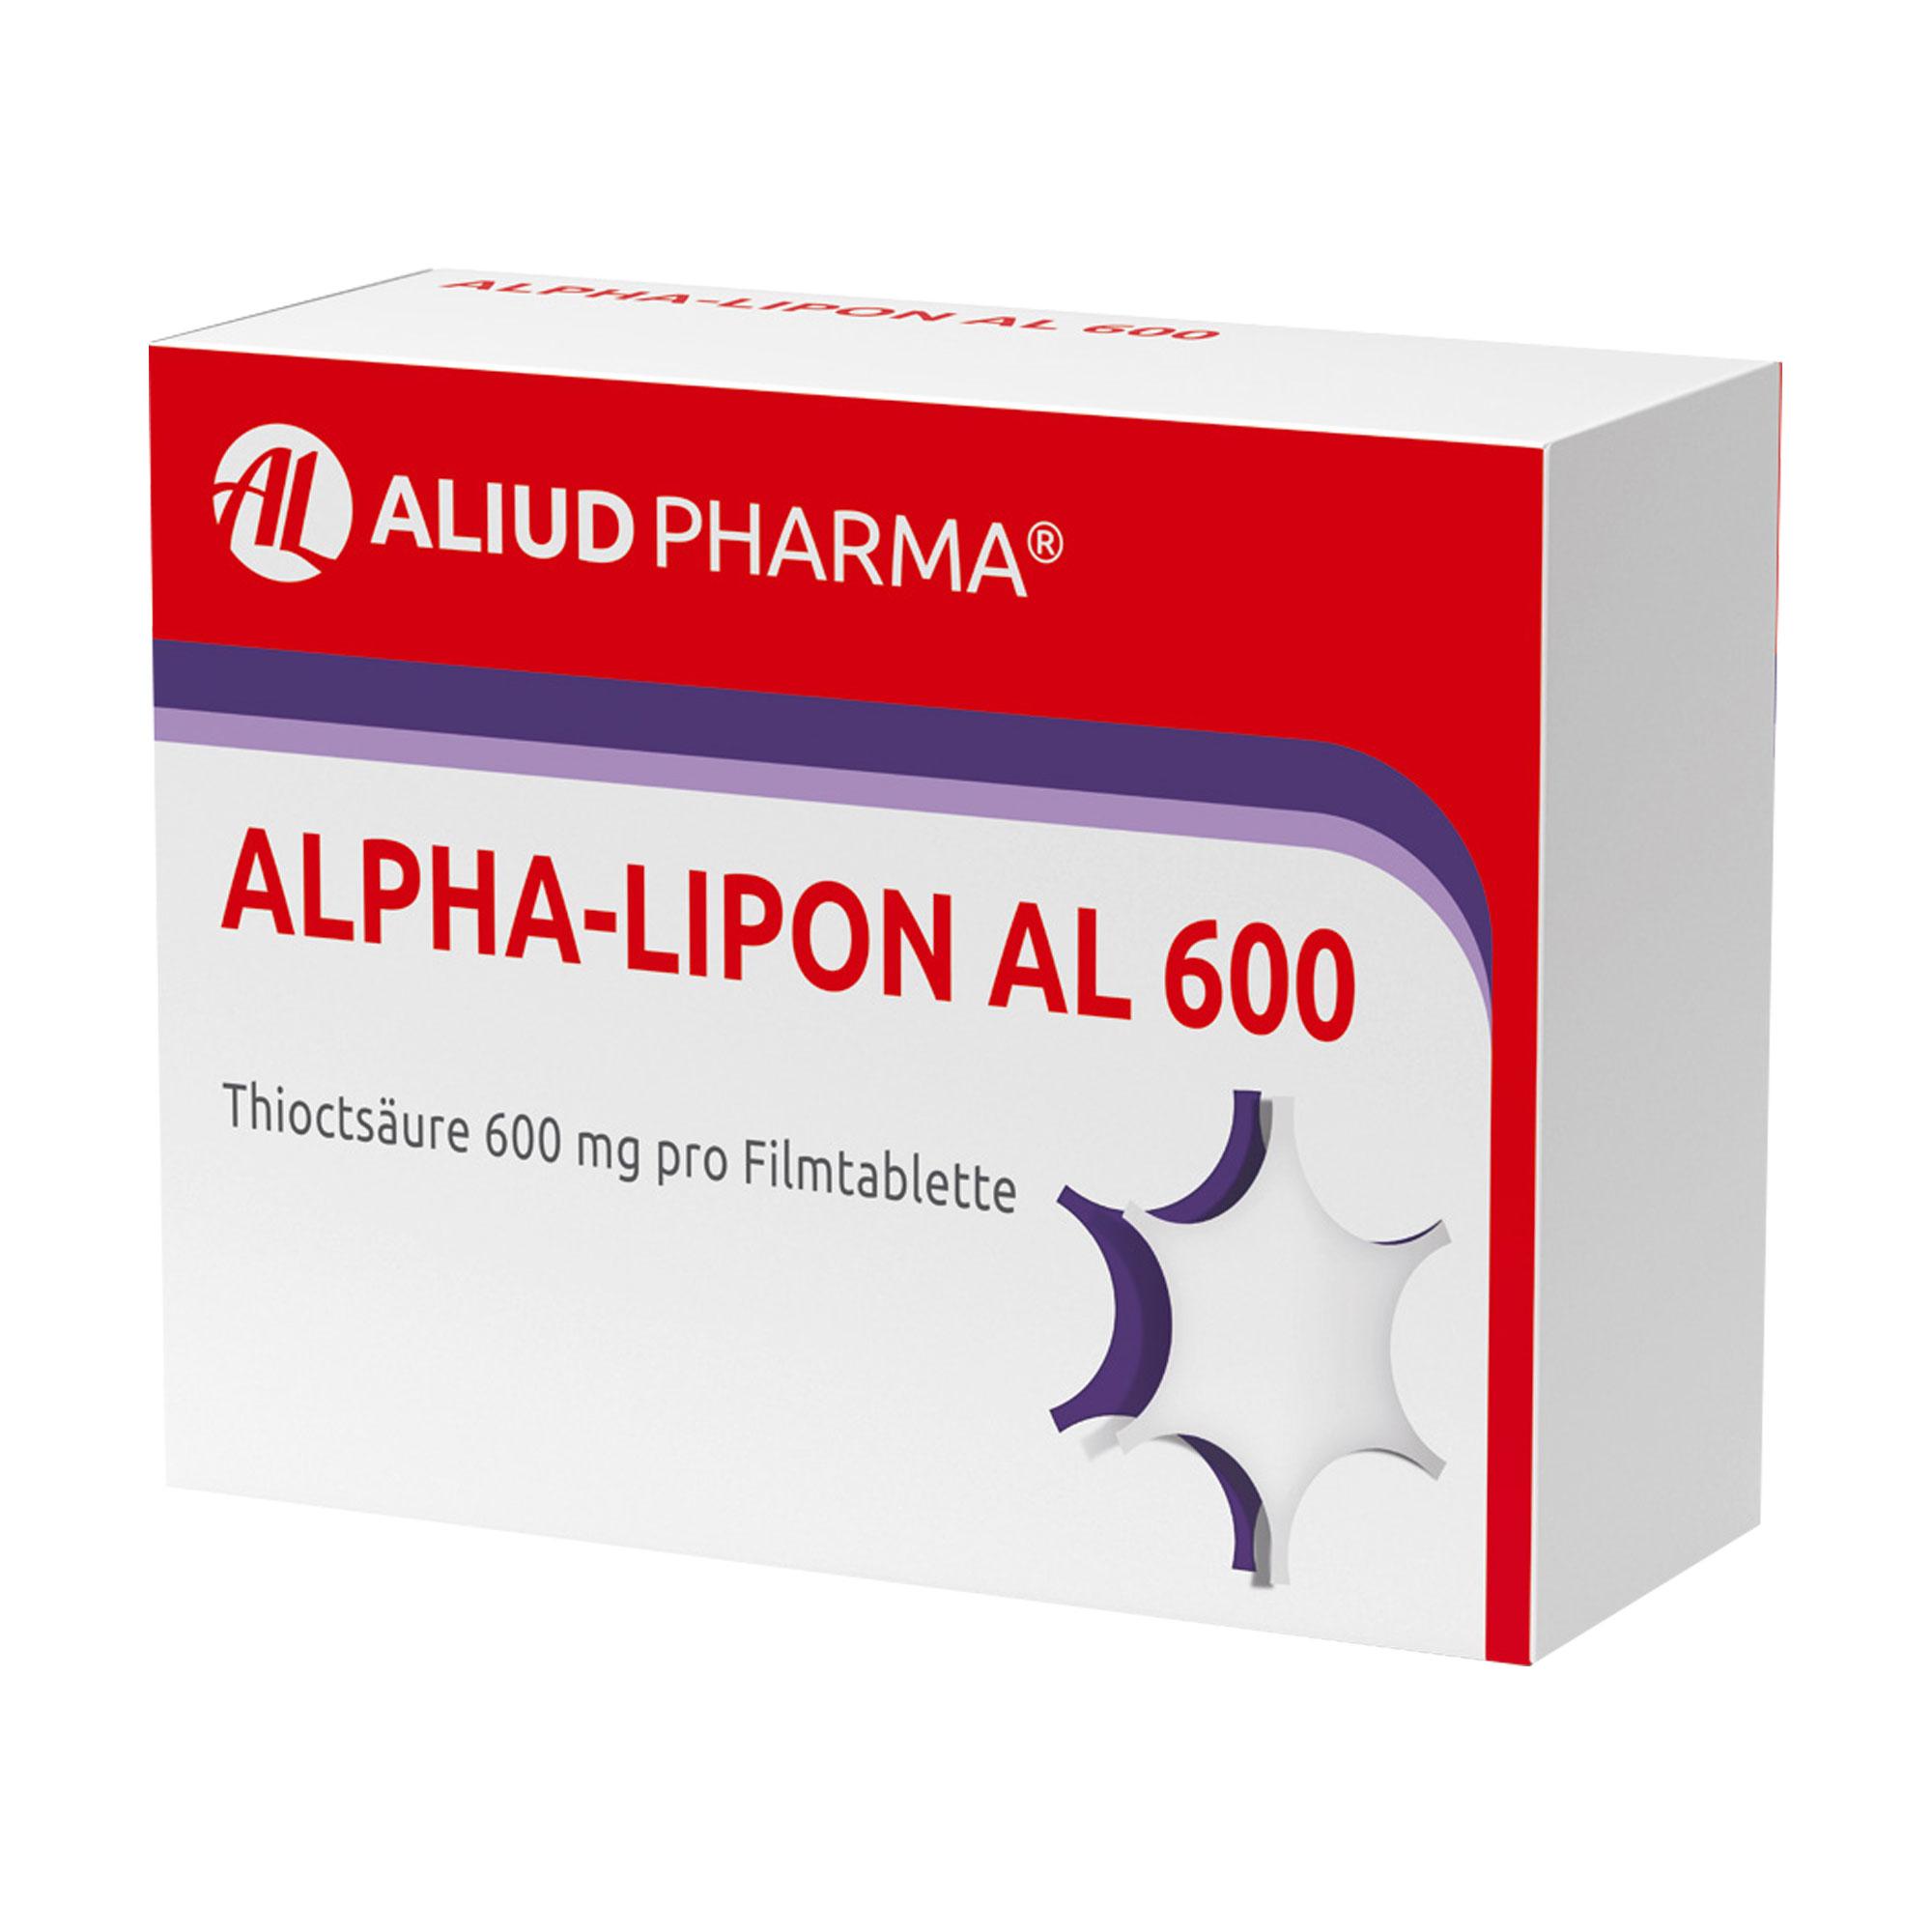 Alpha Lipon AL 600